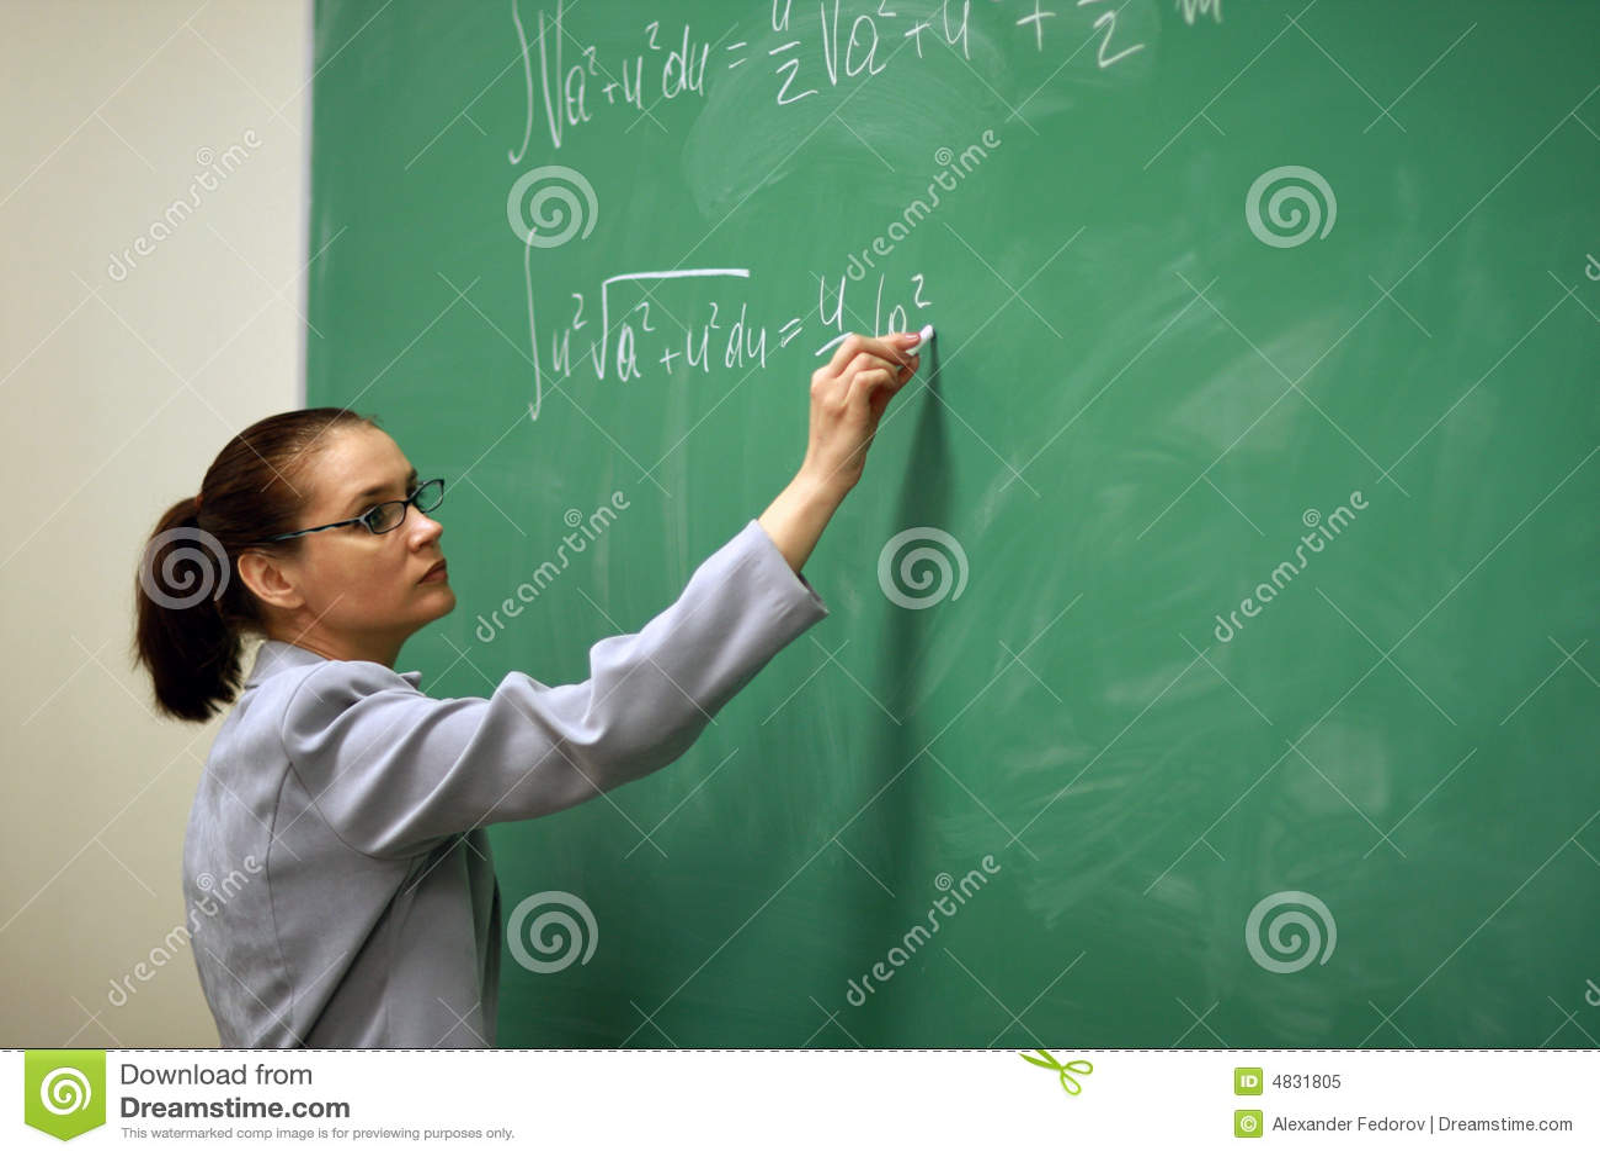 Essay teachers